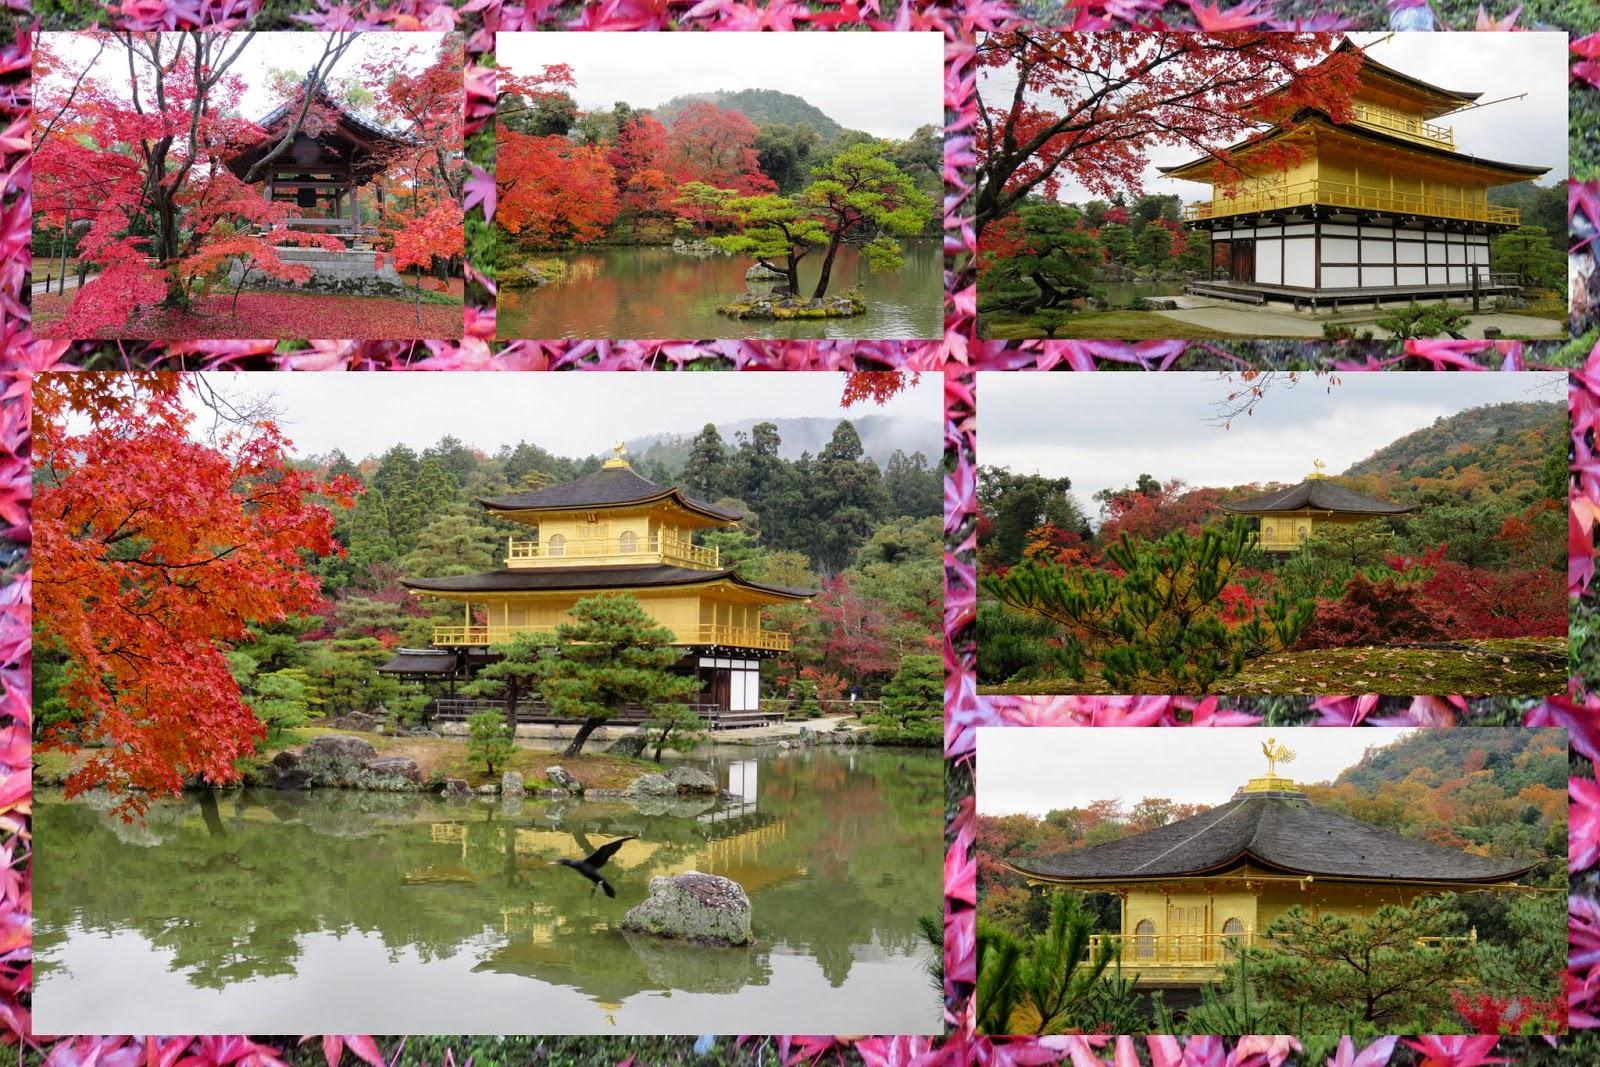 Kinkaku-ji Golden Pavilion in Kyoto